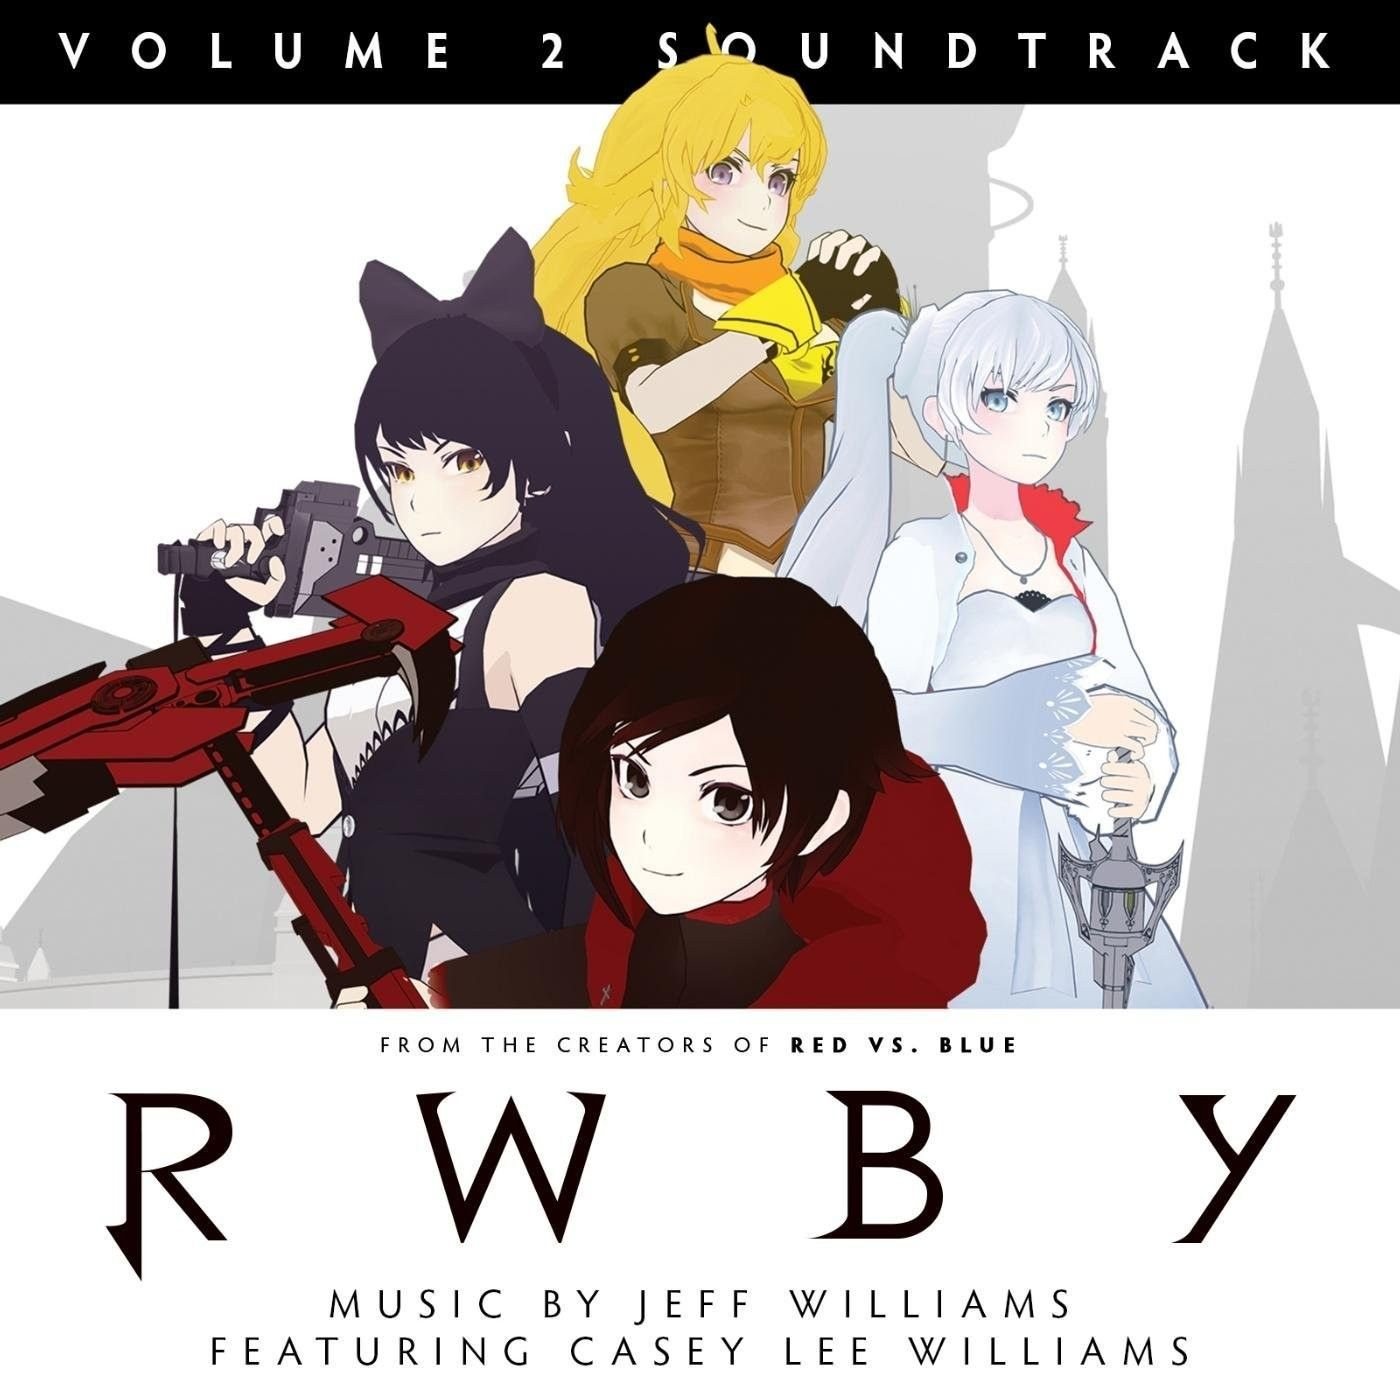 RWBY: Volume 2 Soundtrack